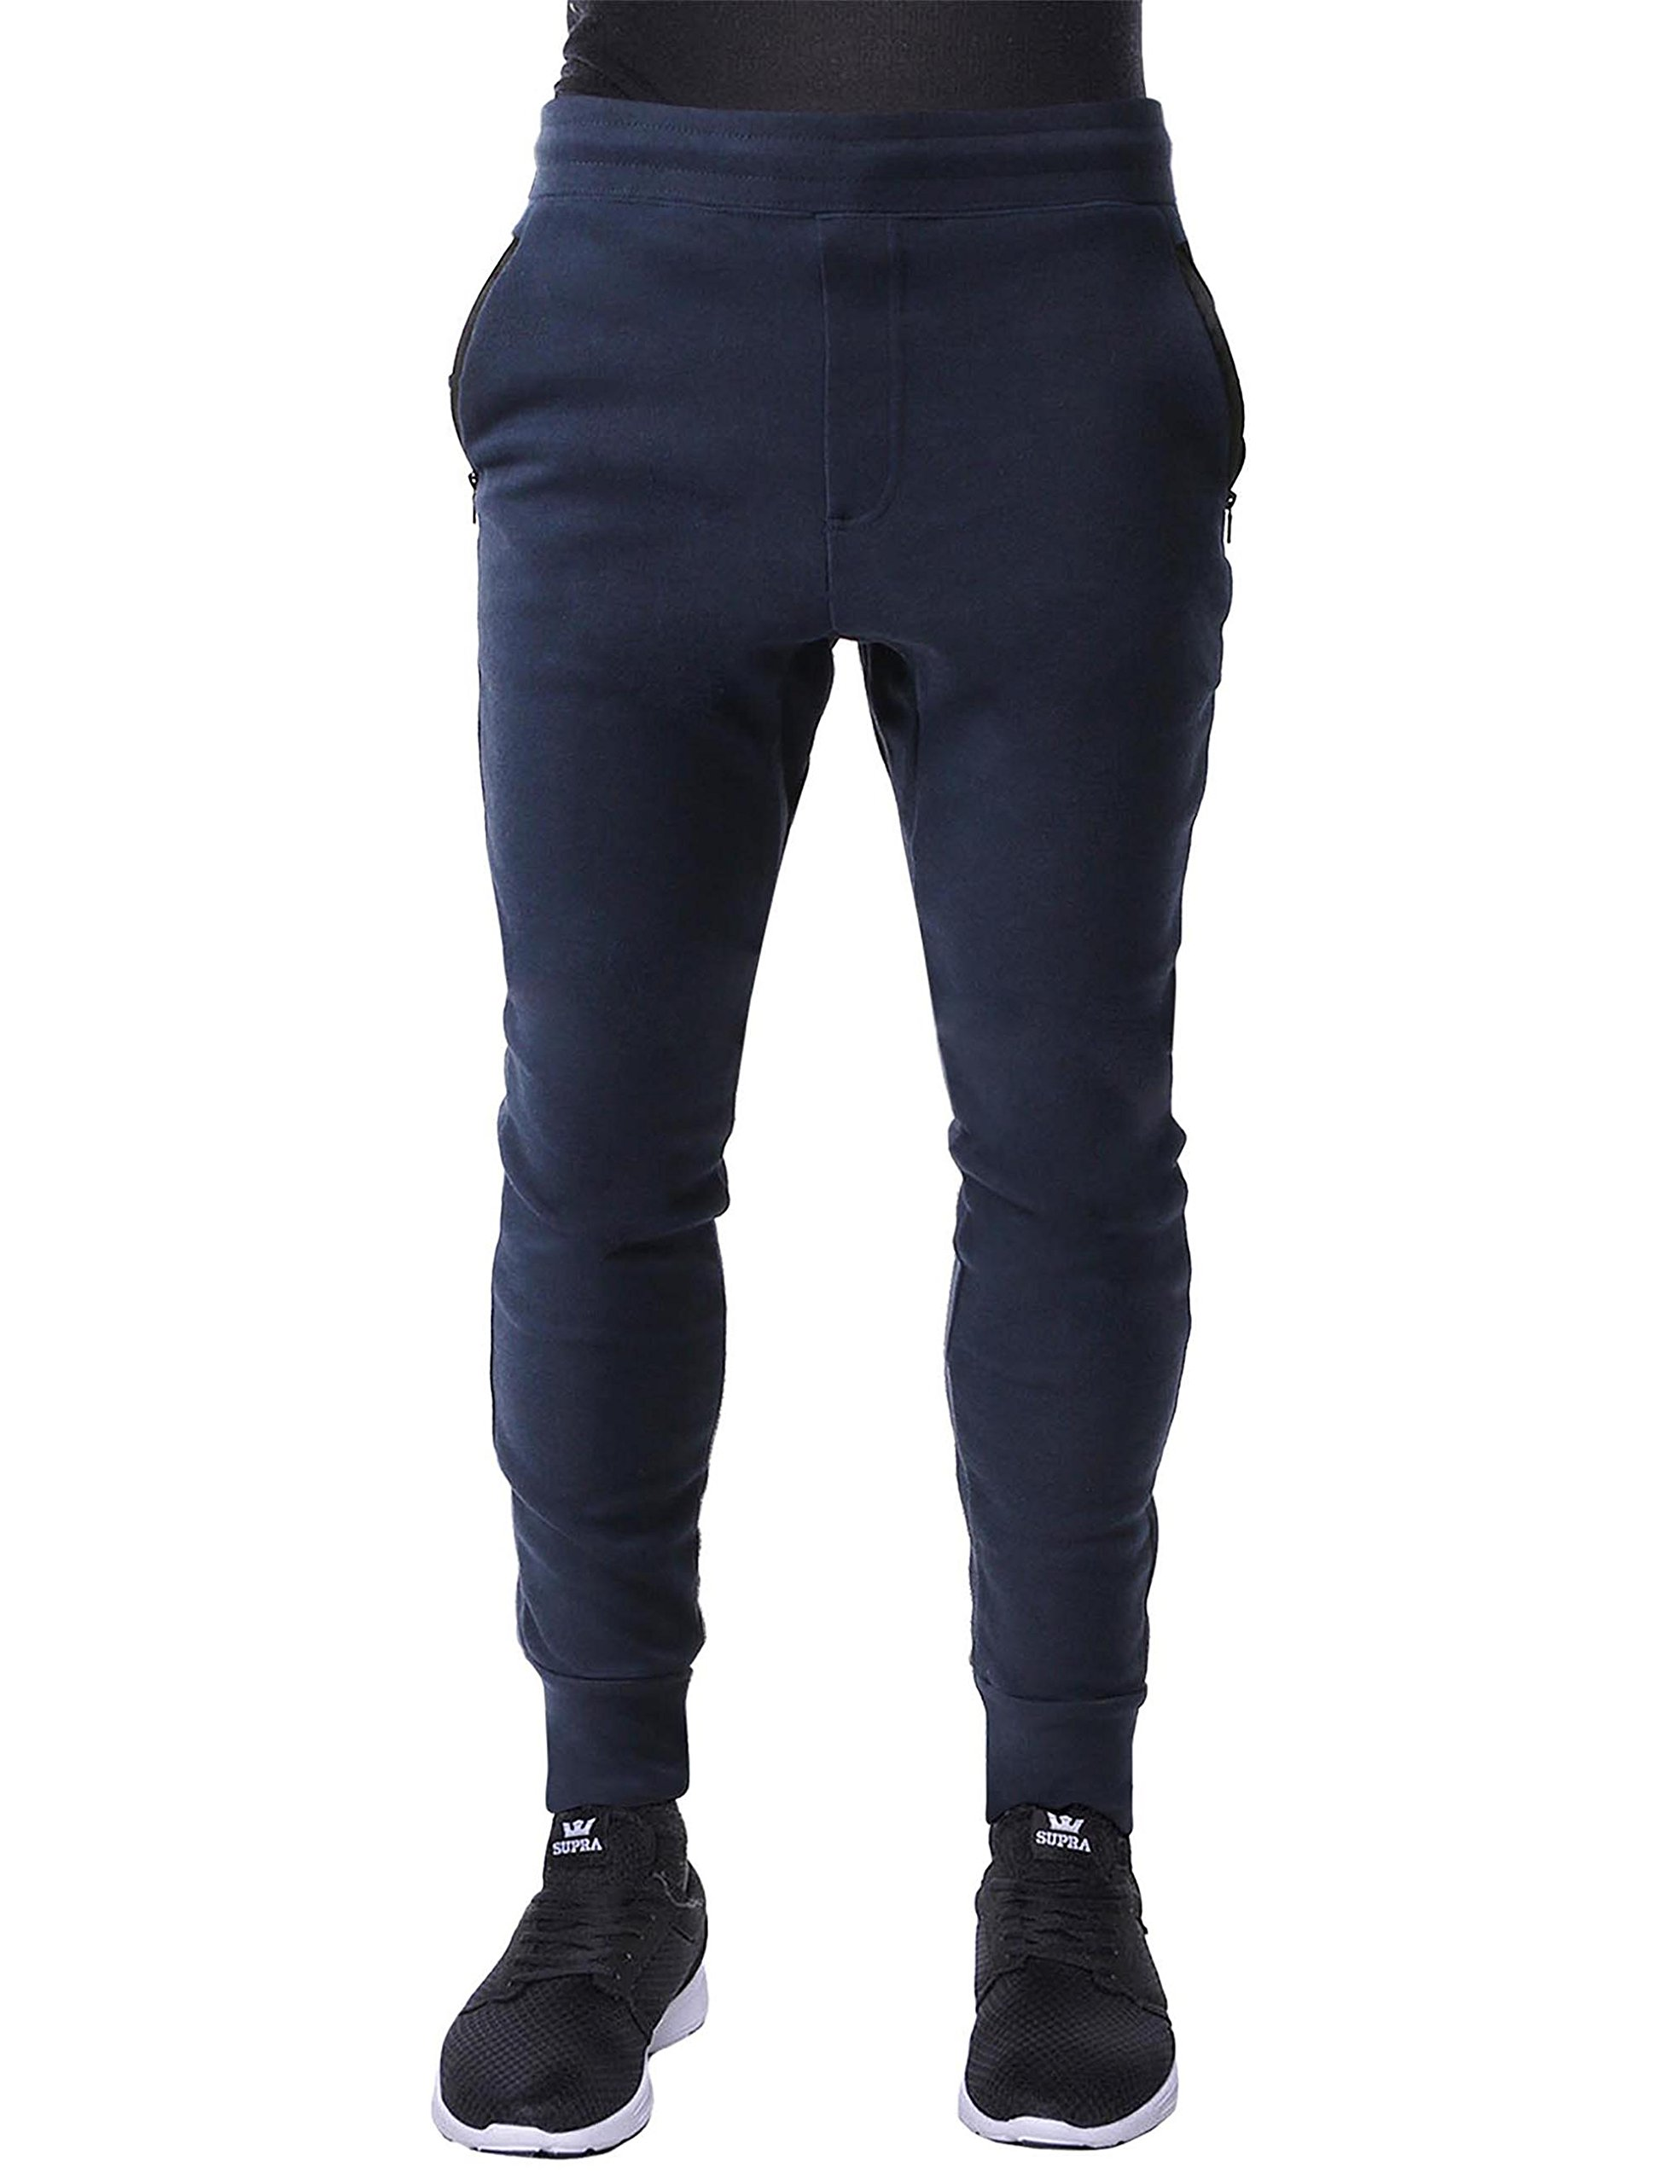 1f8a792004c63b Galleon - Hat And Beyond Mens Fleece Jogger Pants Elastic Active Basic  Urban Harem Slim Fit (Small, IPJ079 Navy)